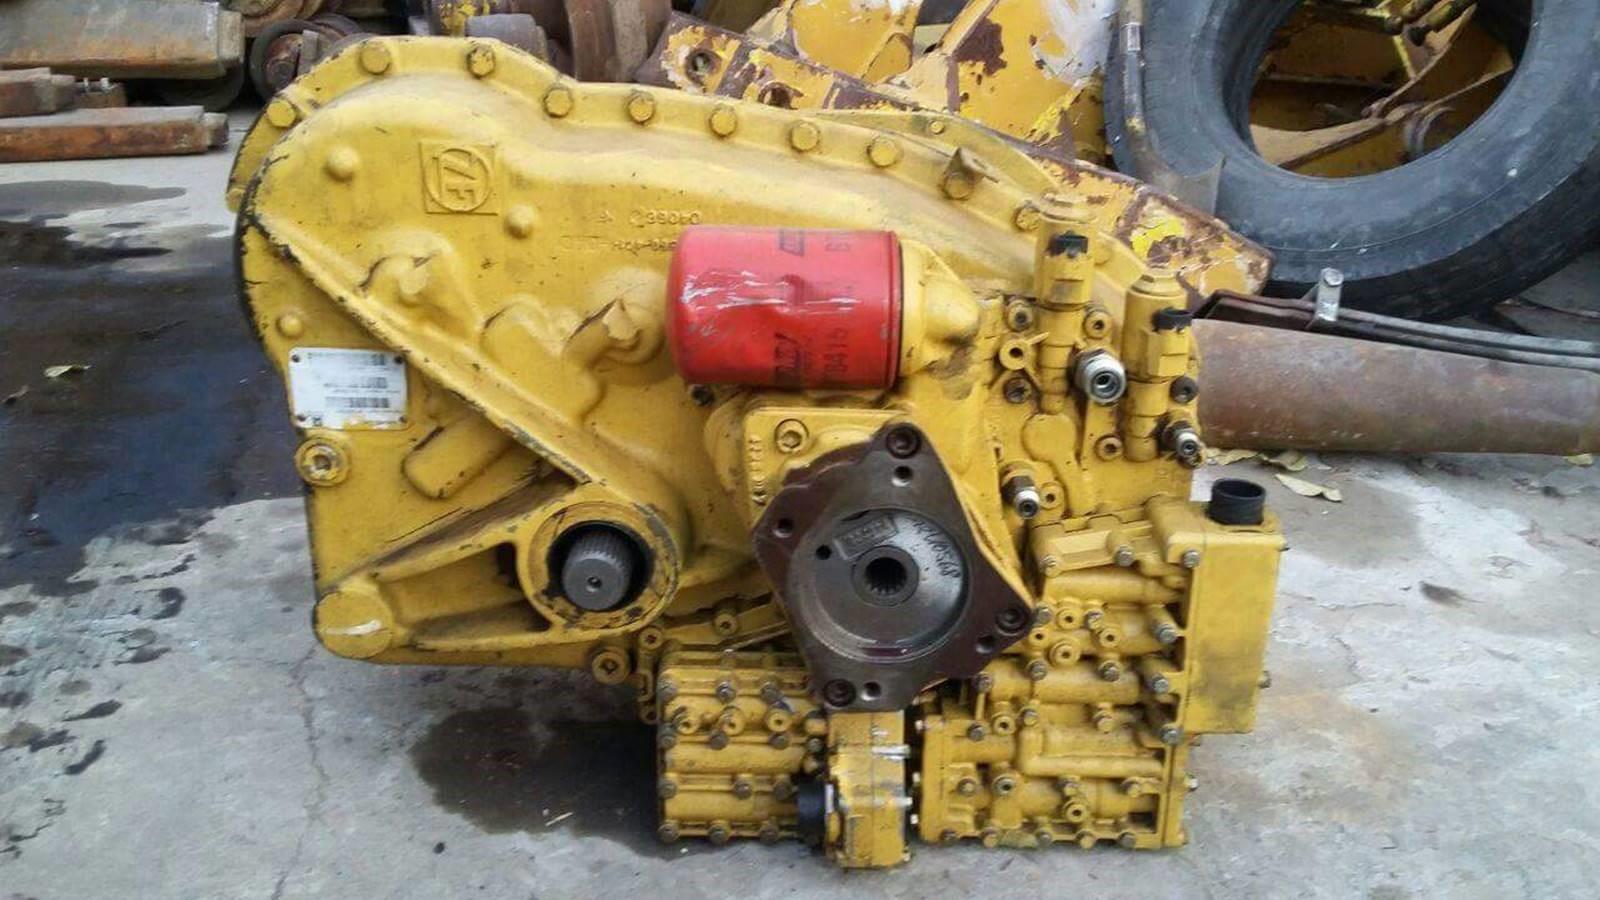 AMS Construction Parts - 310SG Power Shift Transmission